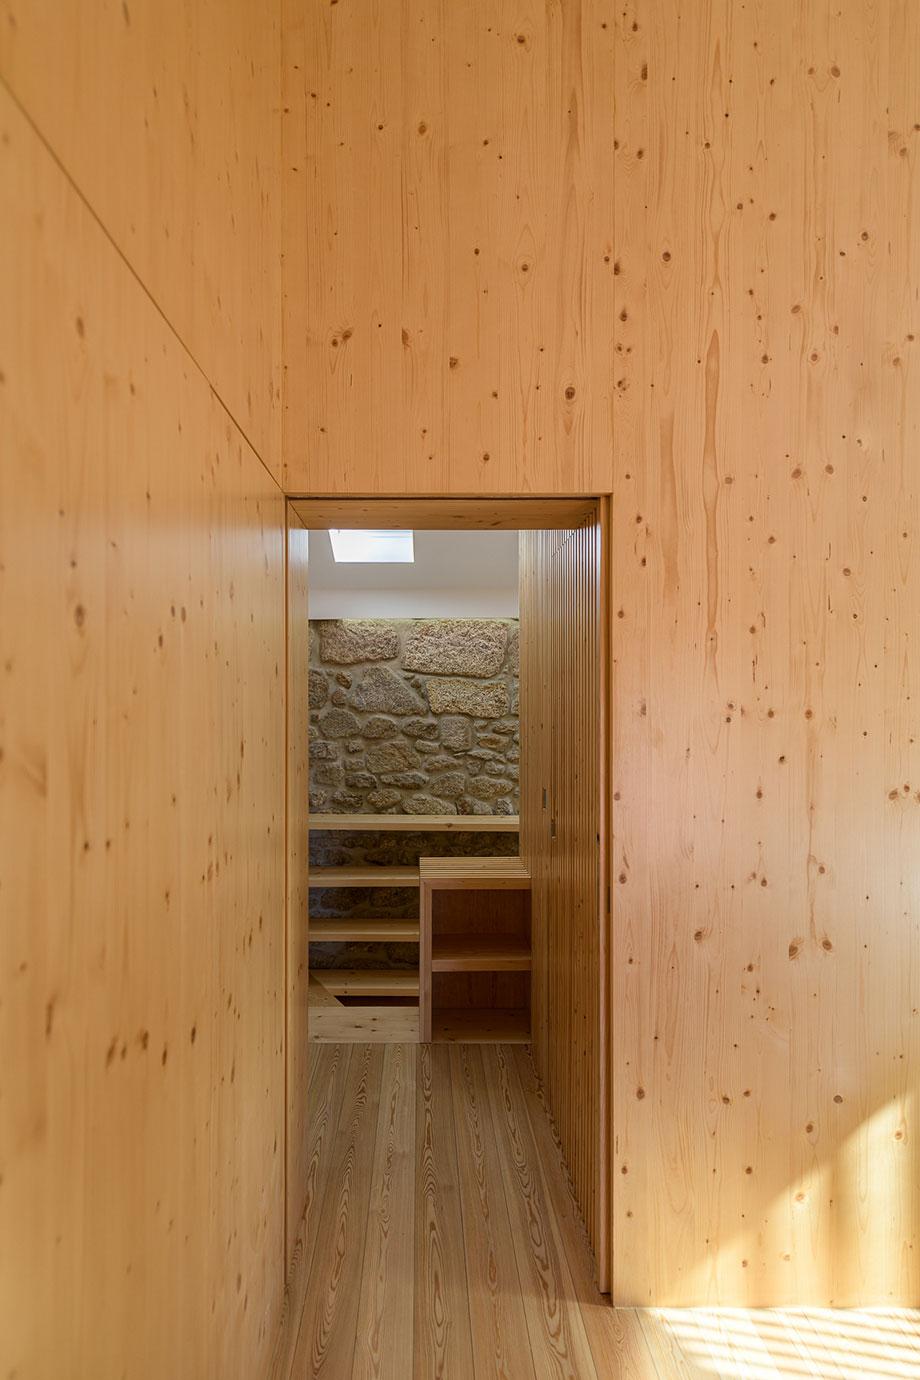 casa rural en portugal de hbg architects (11) - foto ricardo oliveira alves